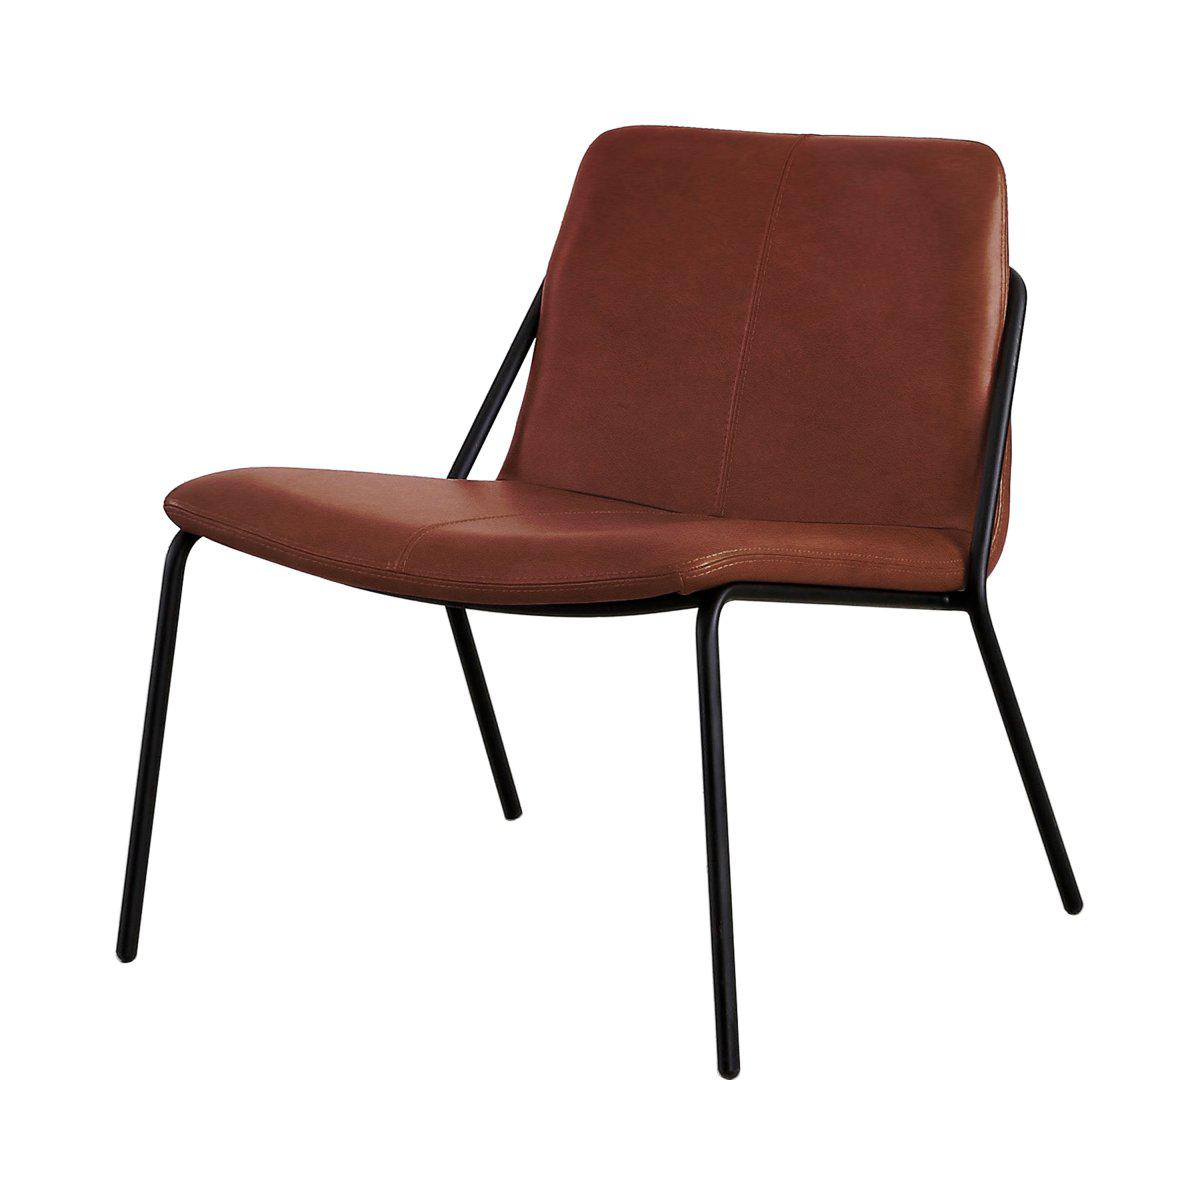 Designer Sling Chairs: M.a.d. Furniture Design